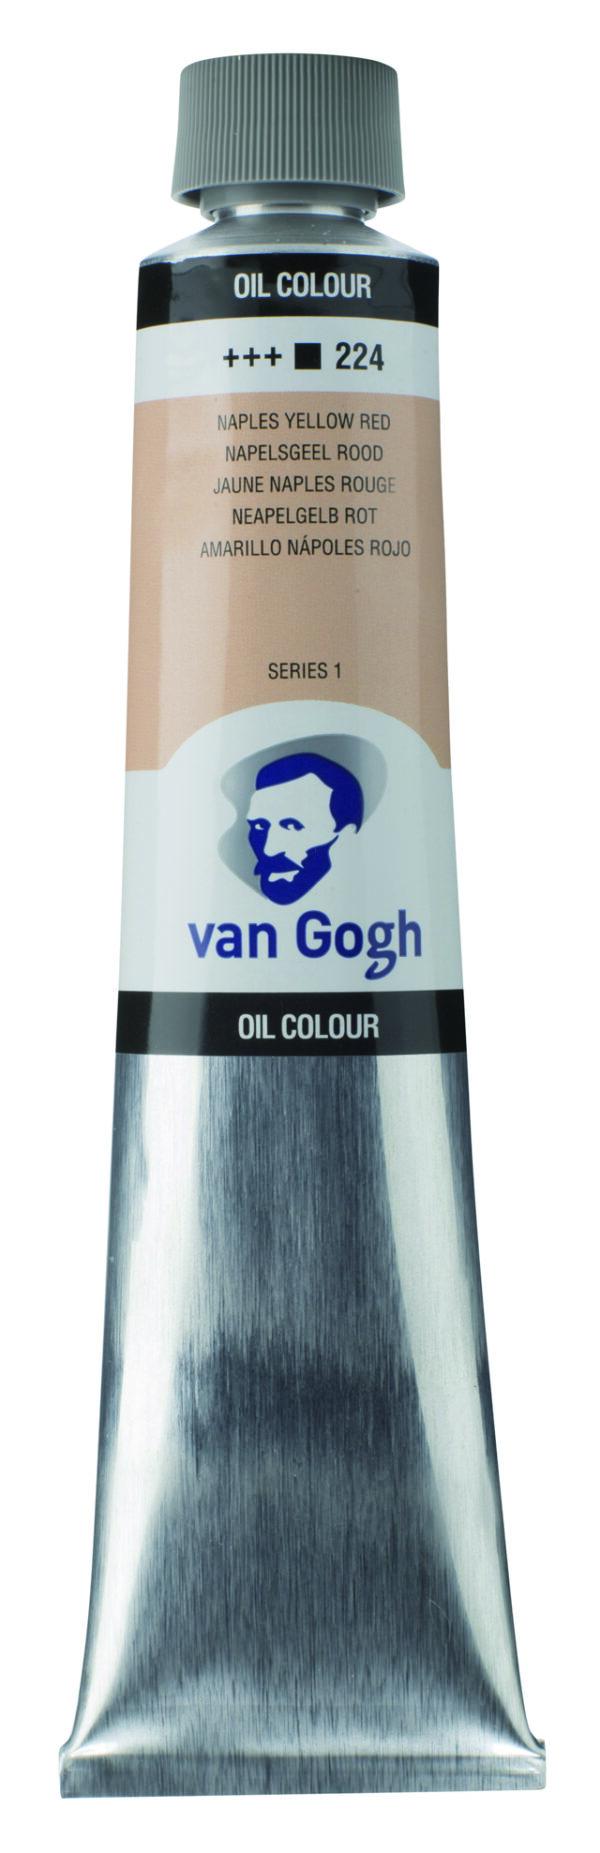 Van Gogh 224 Naples yellow red - 200 ml